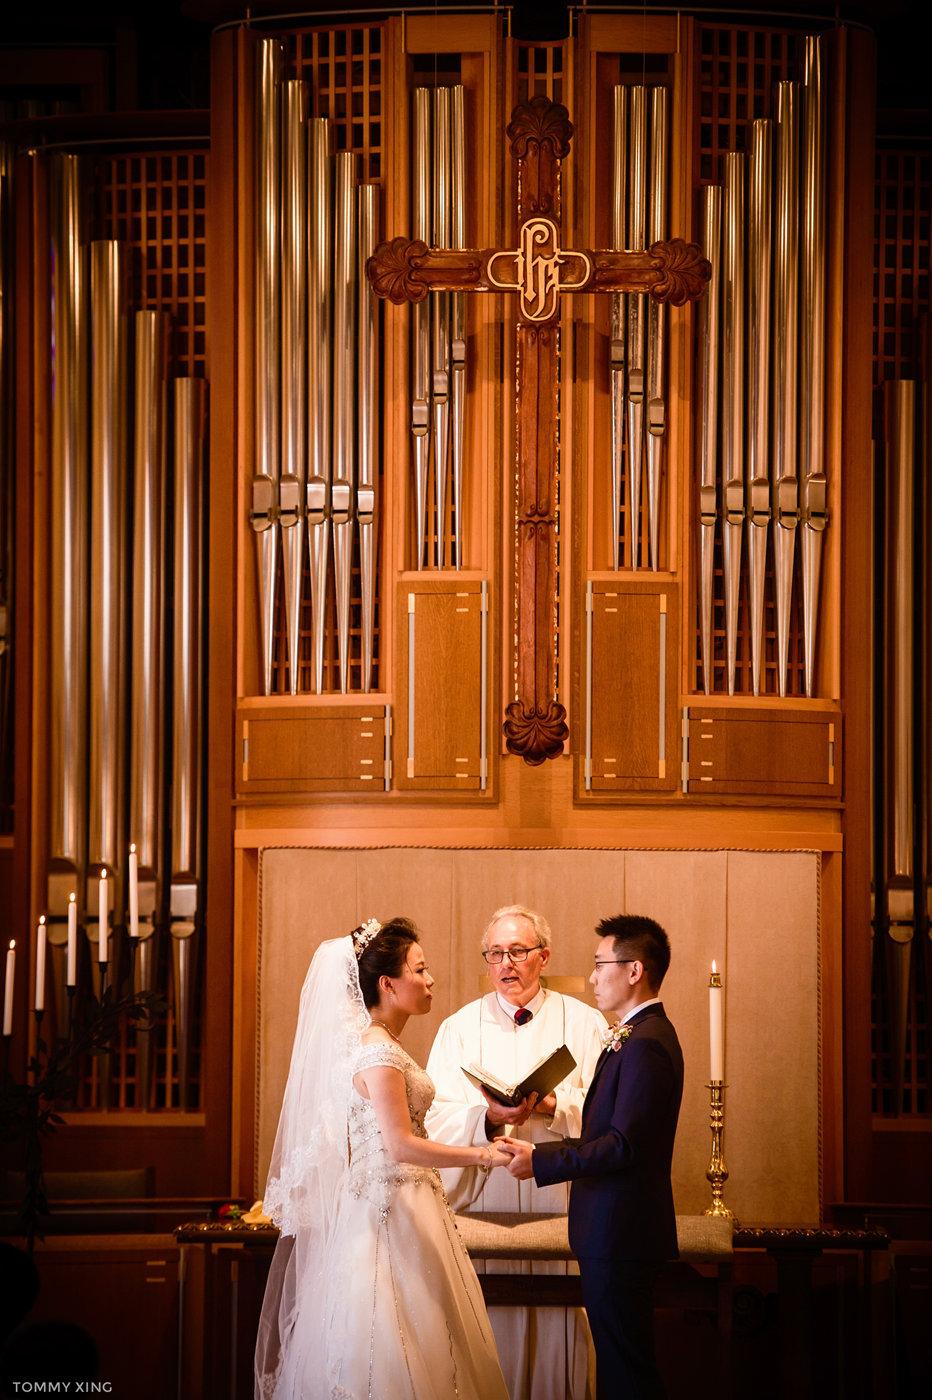 Neighborhood Church Wedding Ranho Palos Verdes Los Angeles Tommy Xing Photography 洛杉矶旧金山婚礼婚纱照摄影师 086.jpg